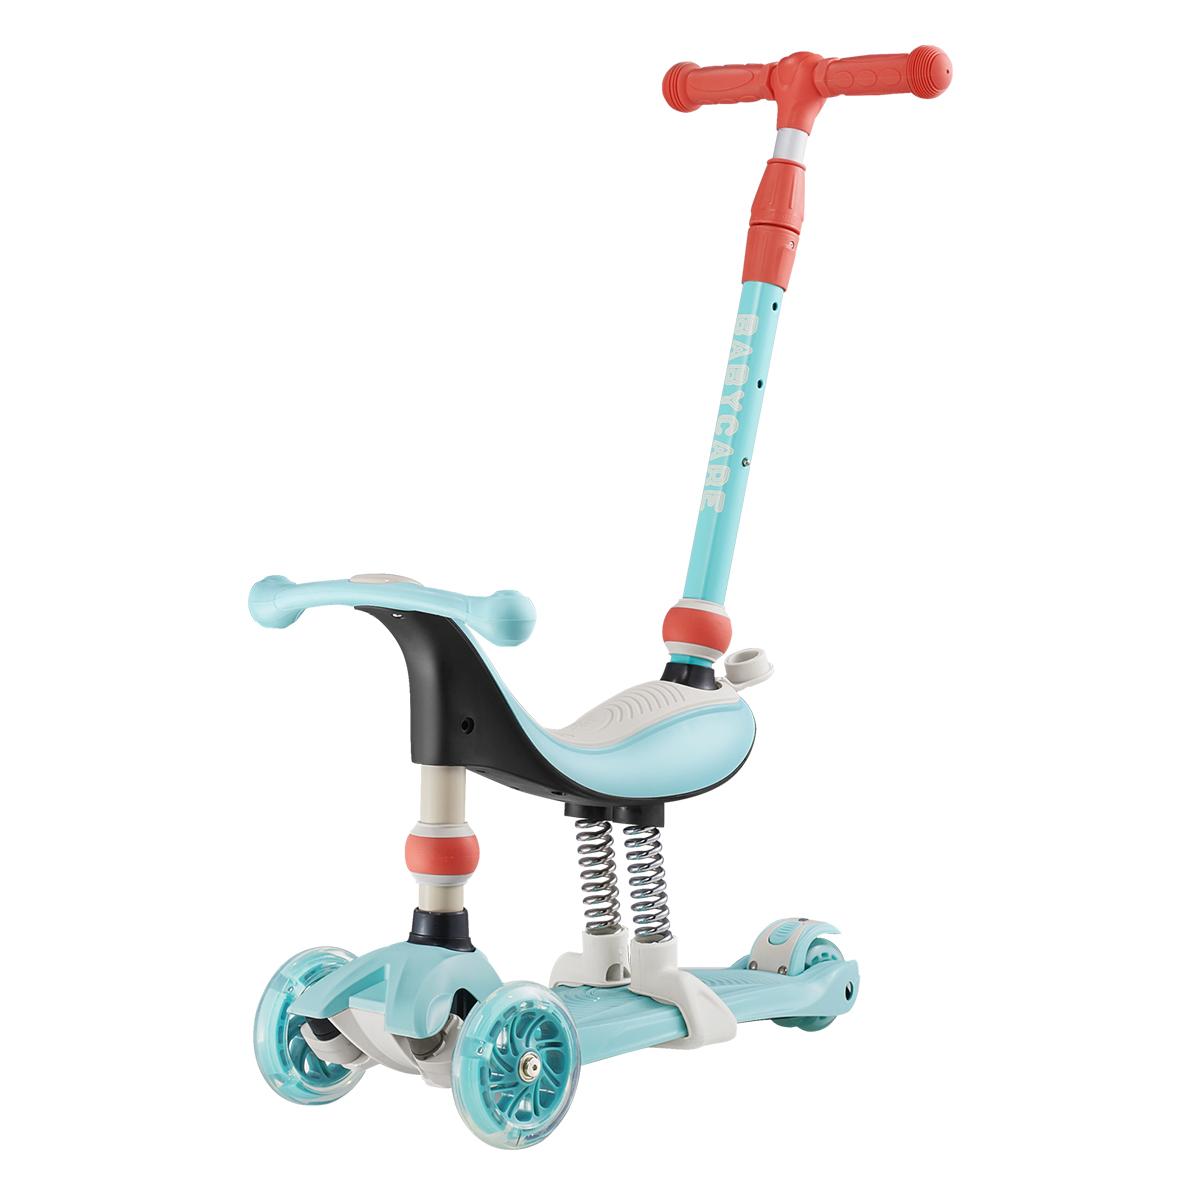 mamicare7911三合一滑板车